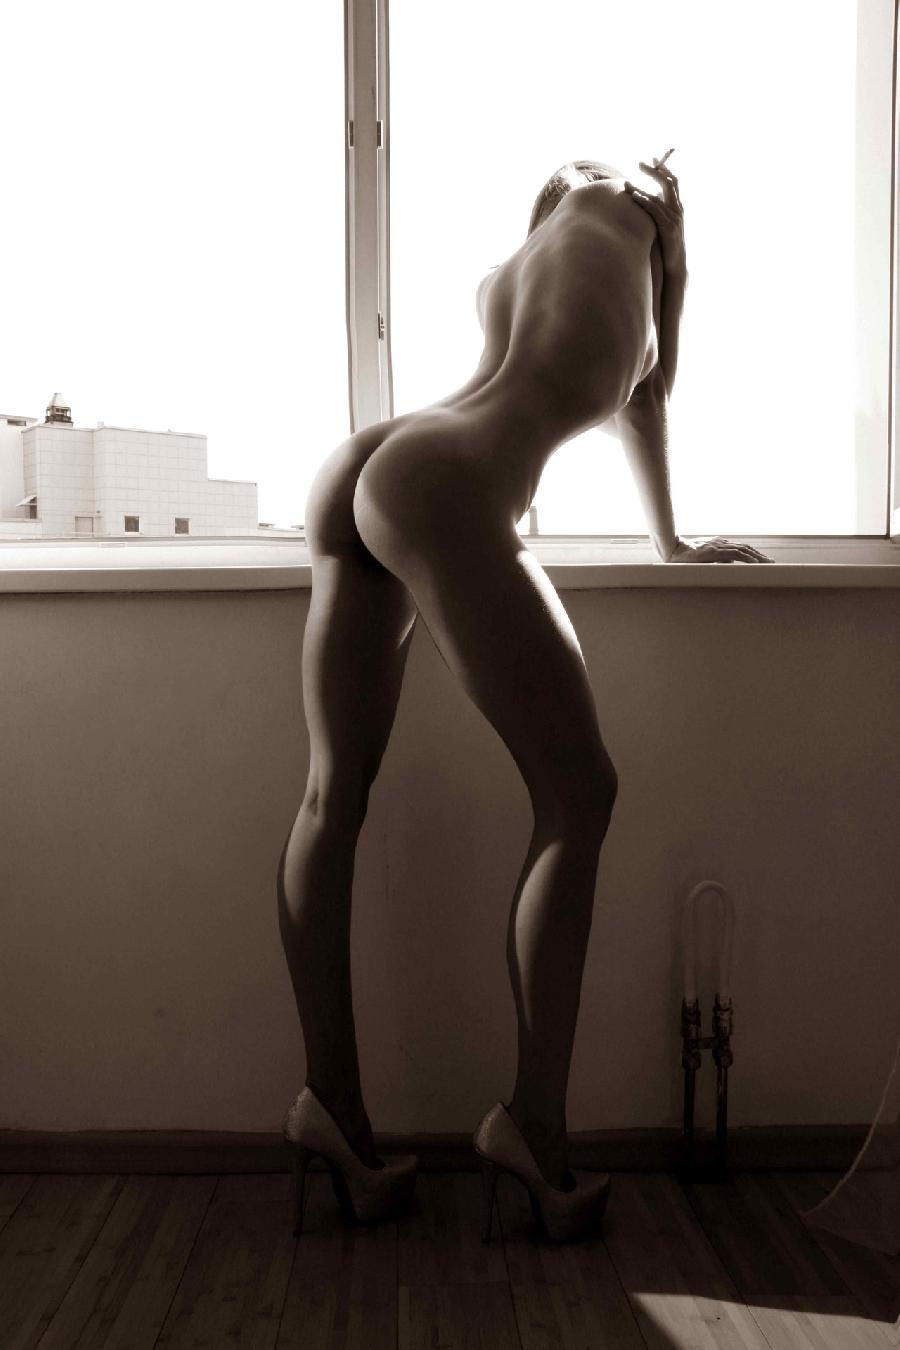 Daily erotic picdump - 85